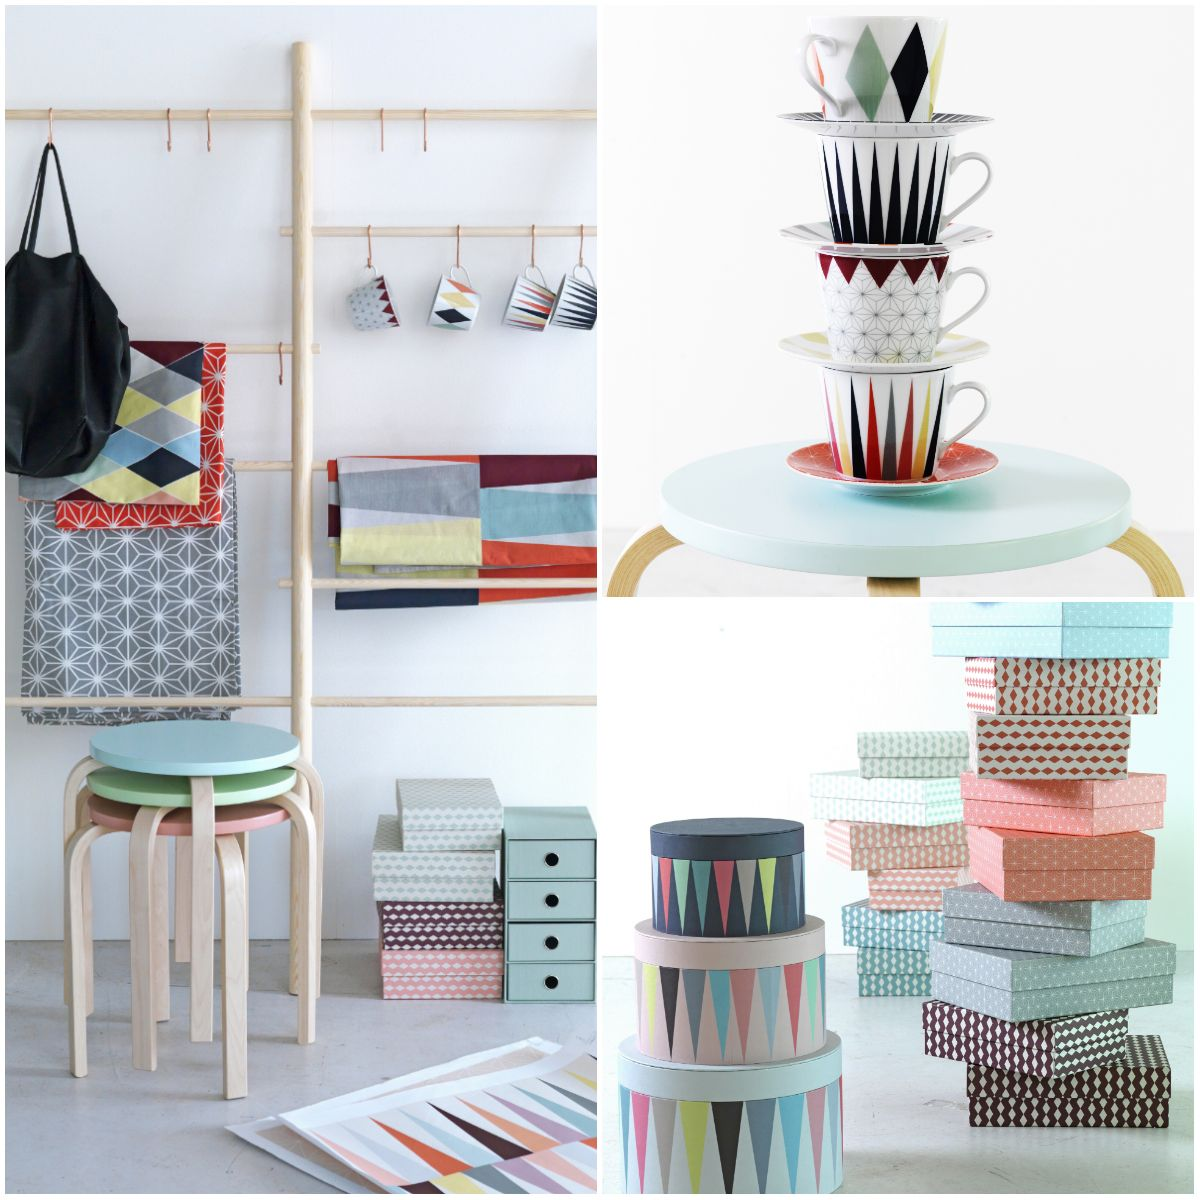 IKEA BRÅKIG: Rebellische Designfreude | Pinspiration